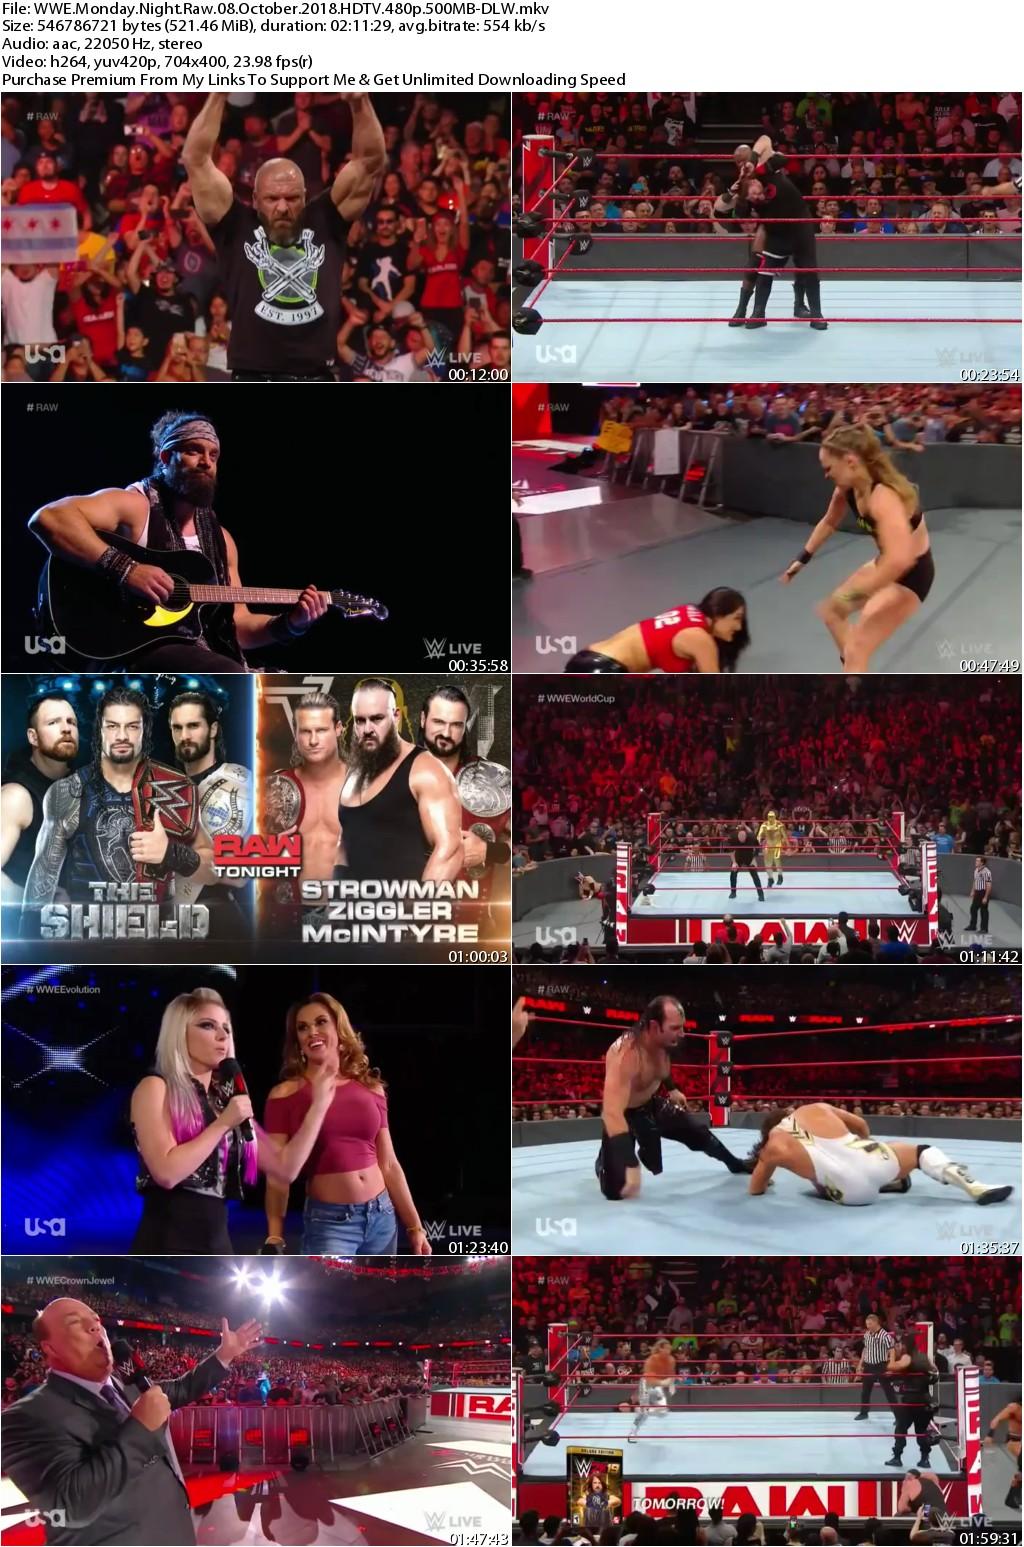 WWE Monday Night Raw 08 October 2018 HDTV 480p 500MB-DLW